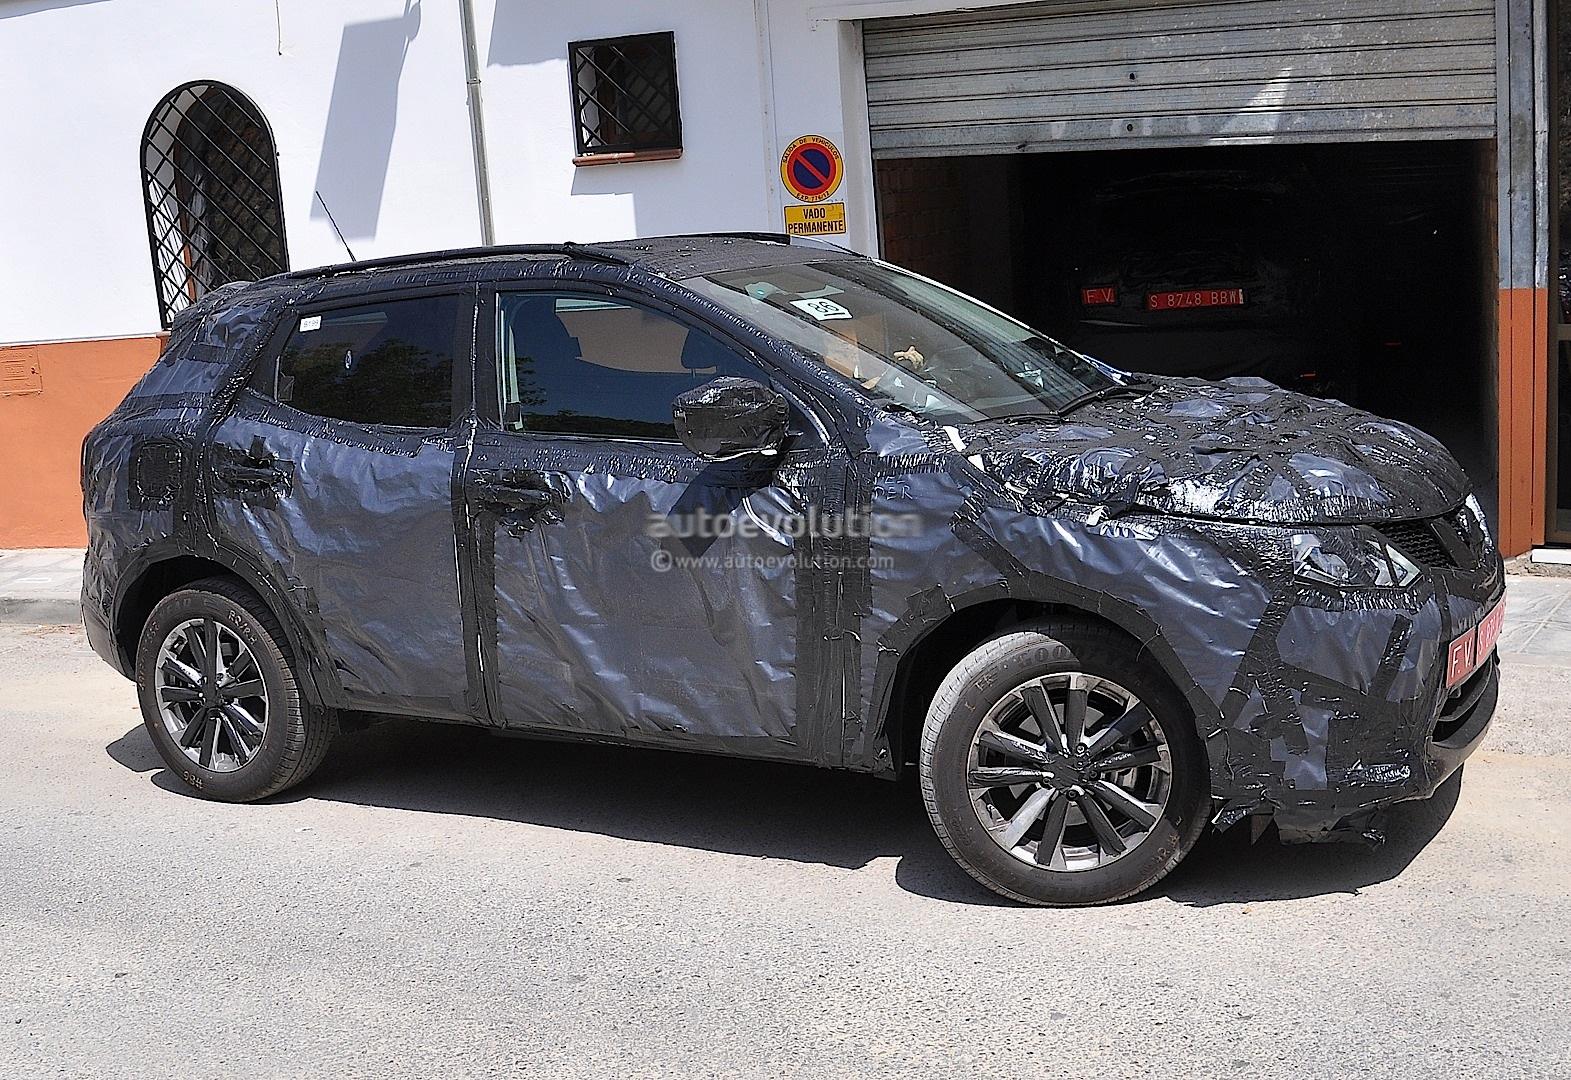 Spyshots 2014 Nissan Qashqai Interior Partially Shown